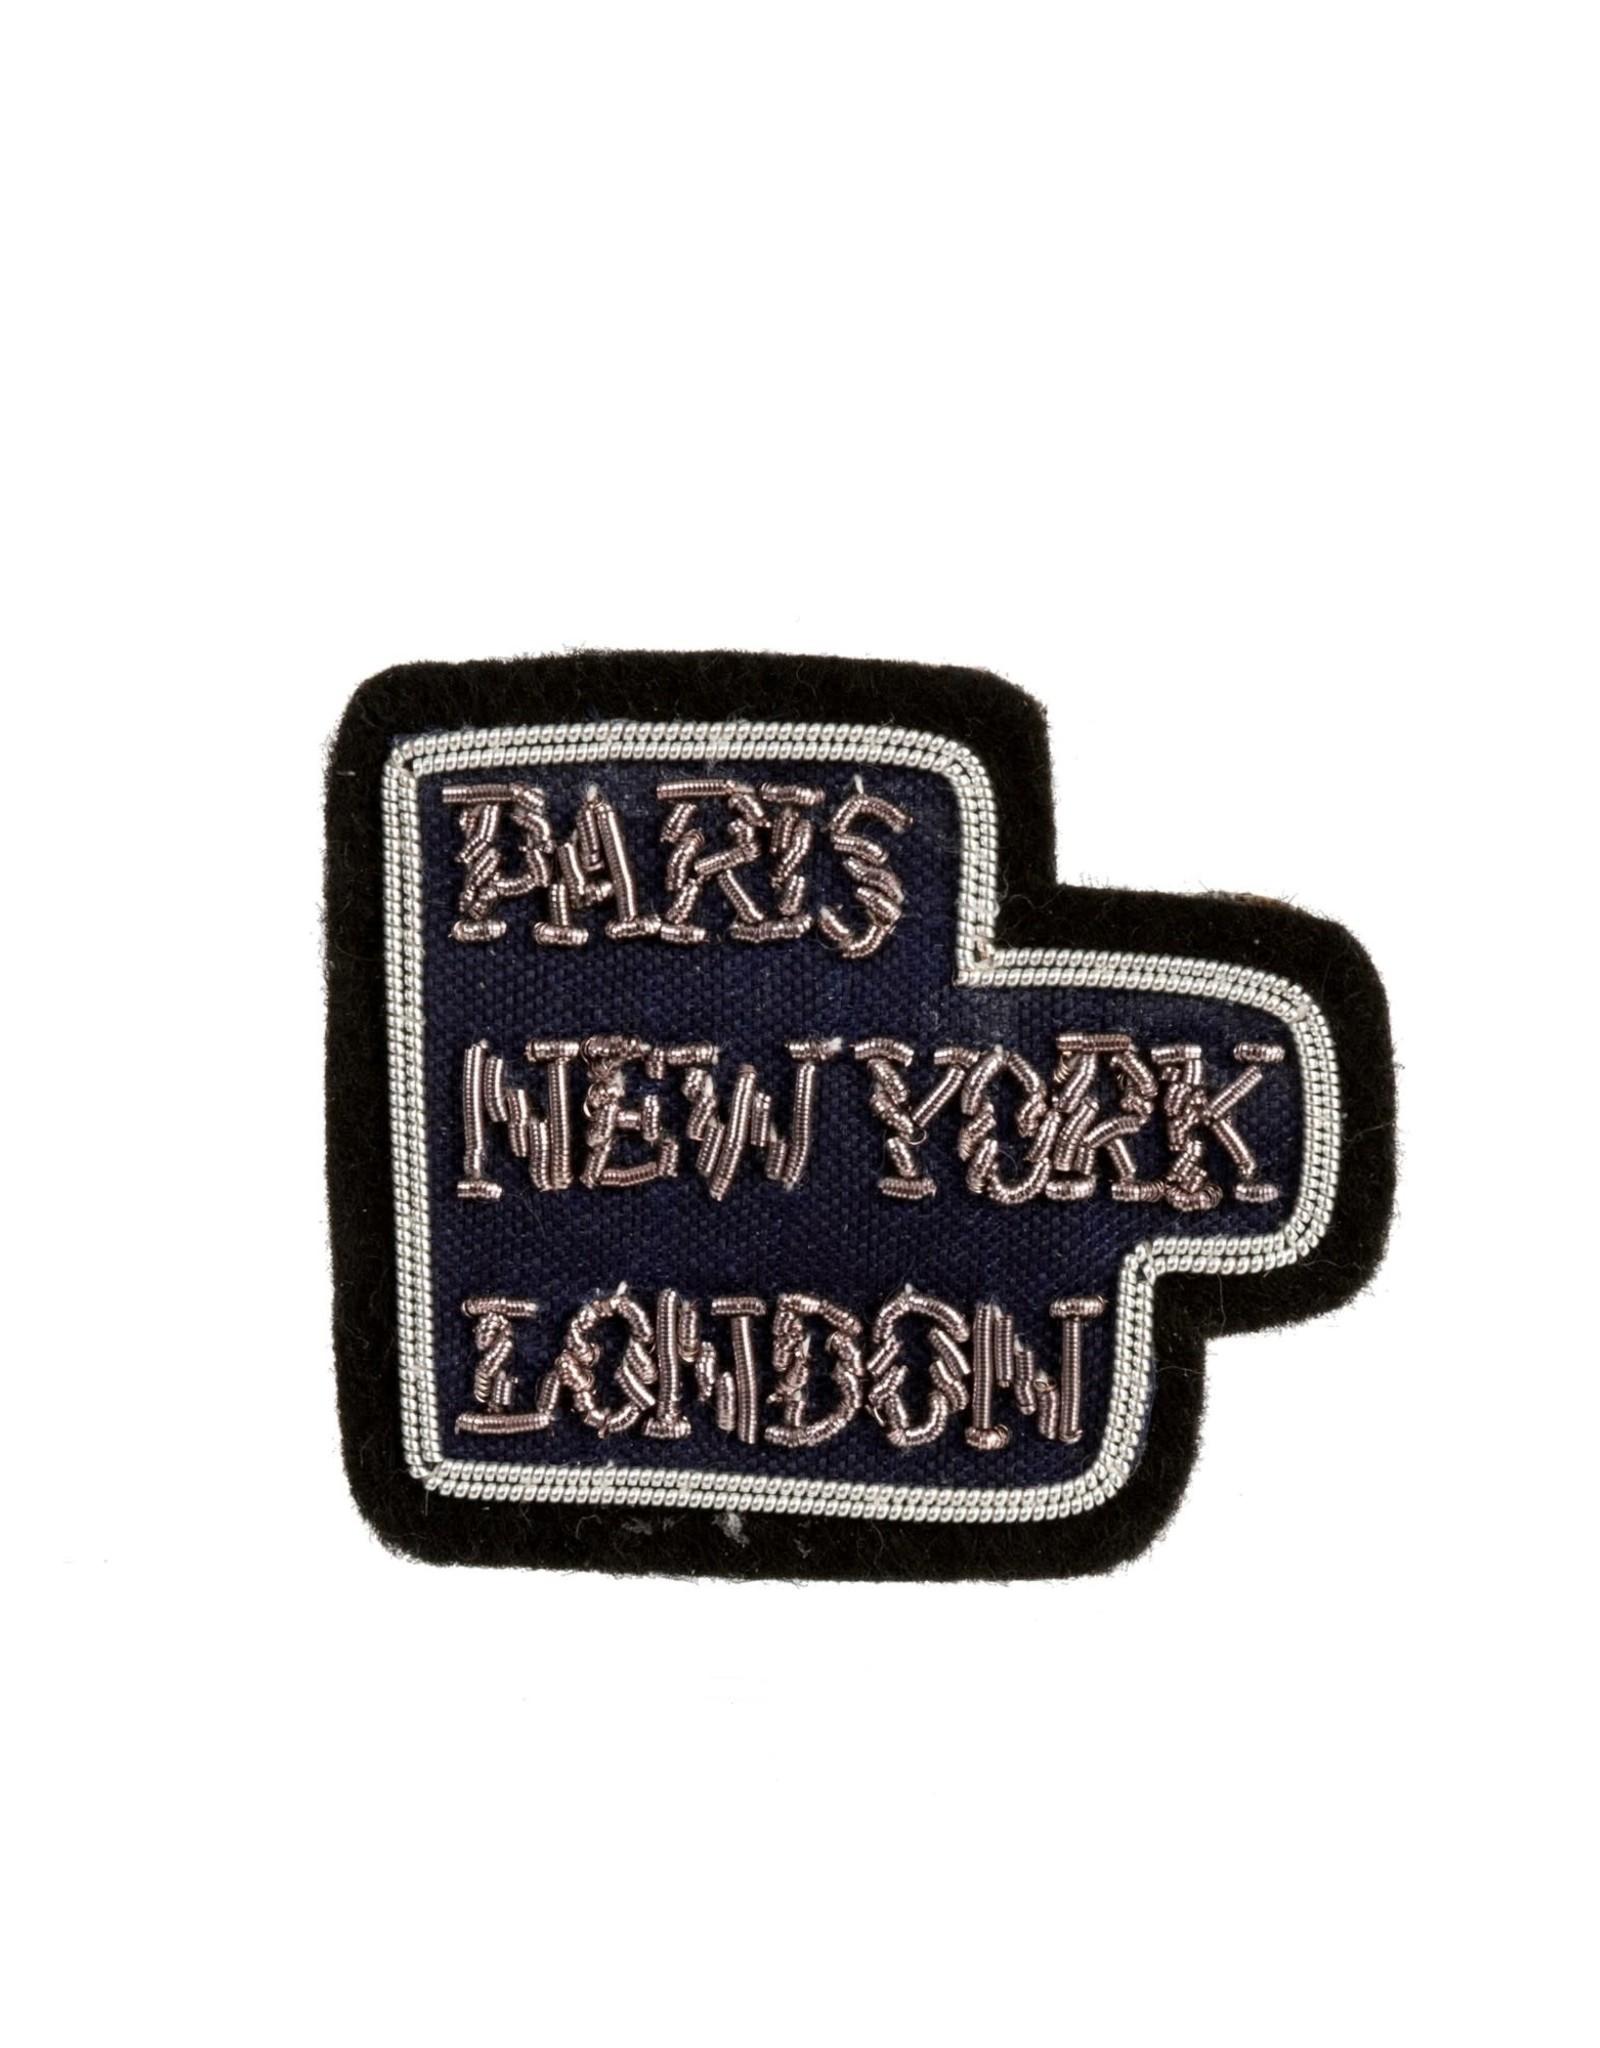 "Indaba ""Paris NY London"" Patch Pin"